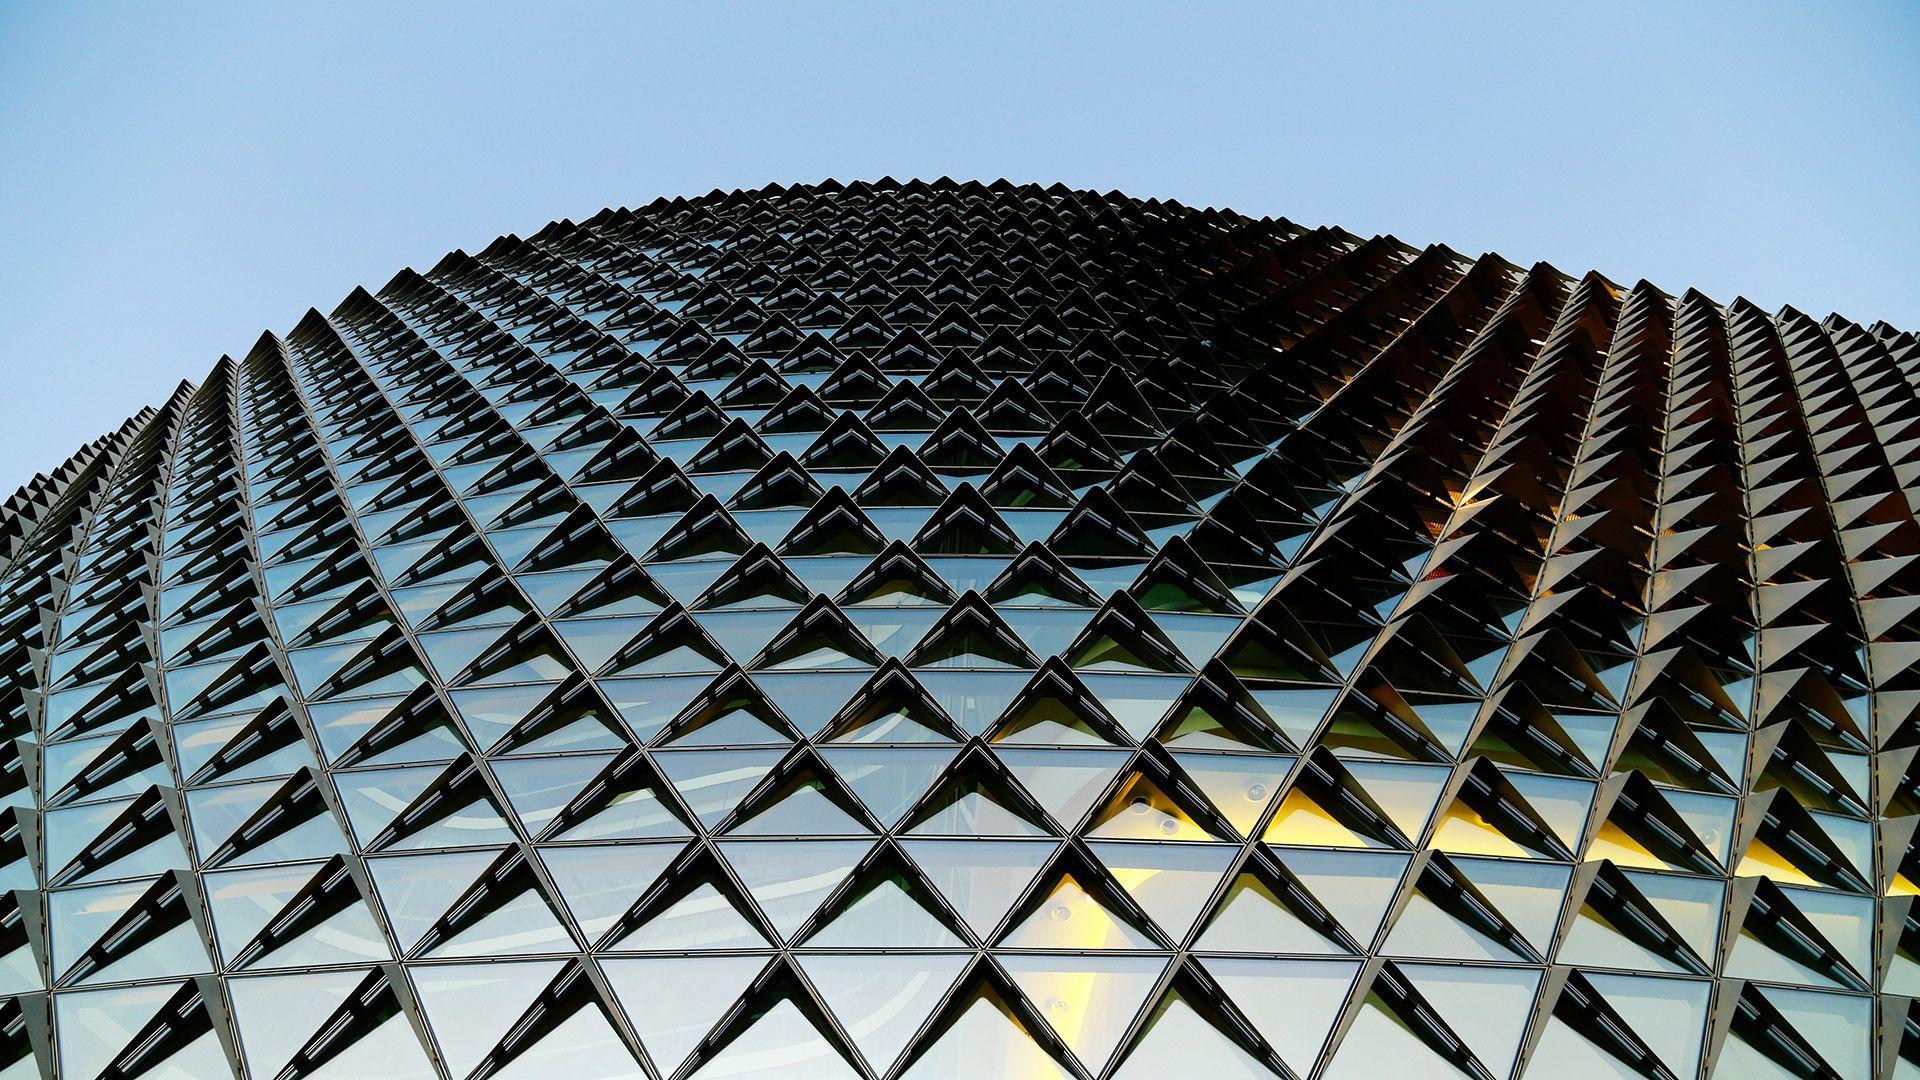 Architecture background hd